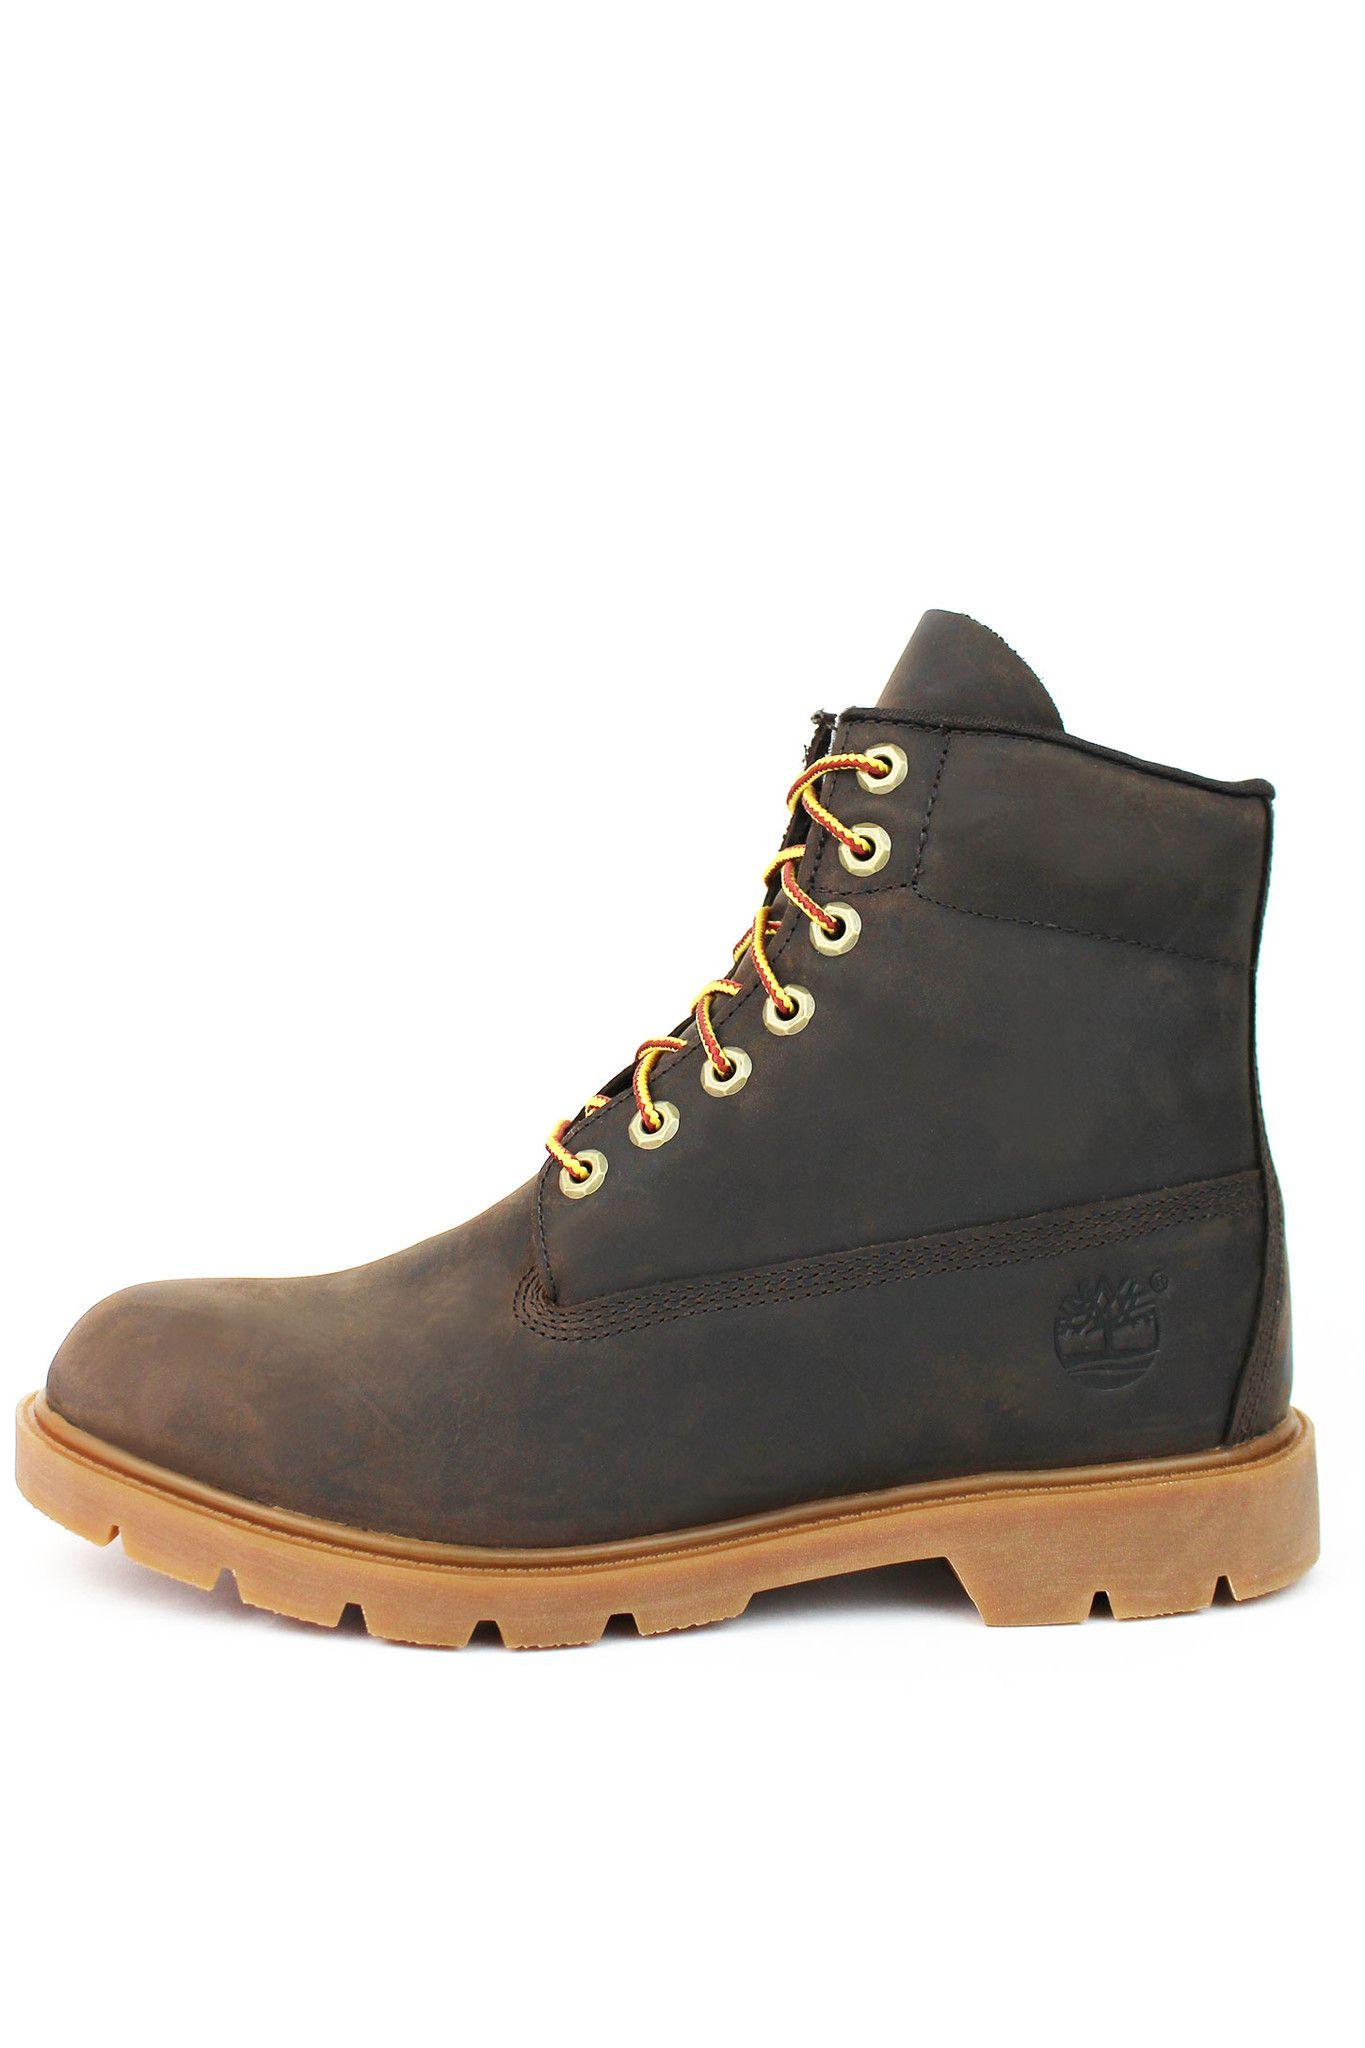 Men's 6 Inch Basic Waterproof Boot Boots